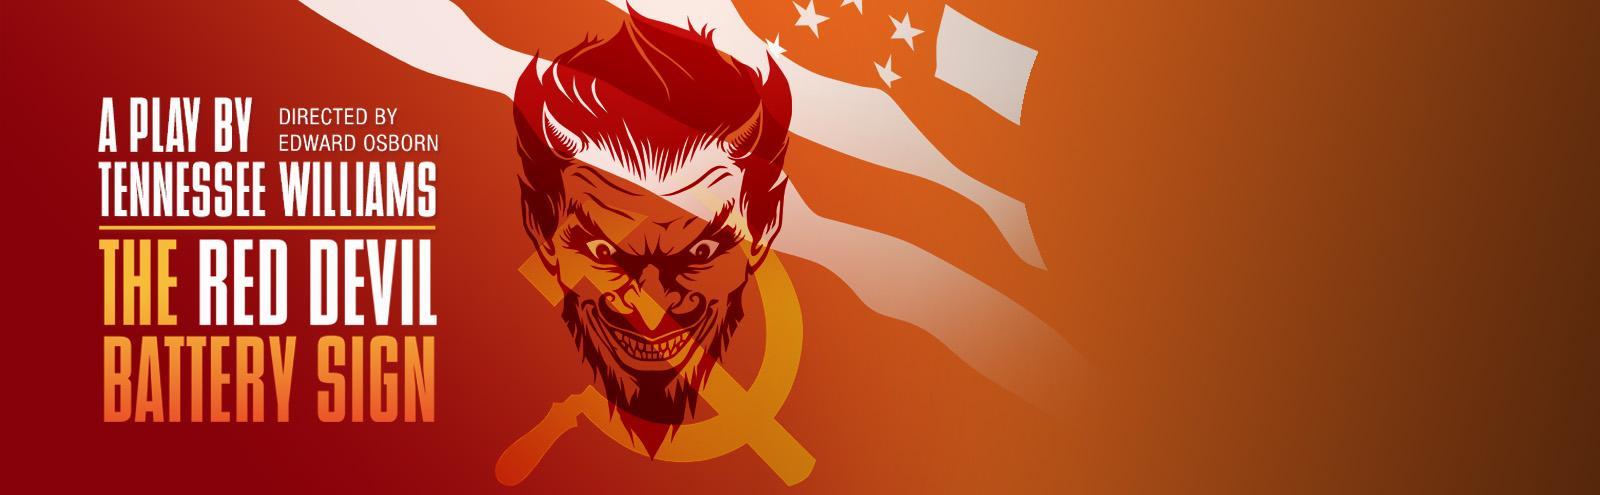 red devil poster